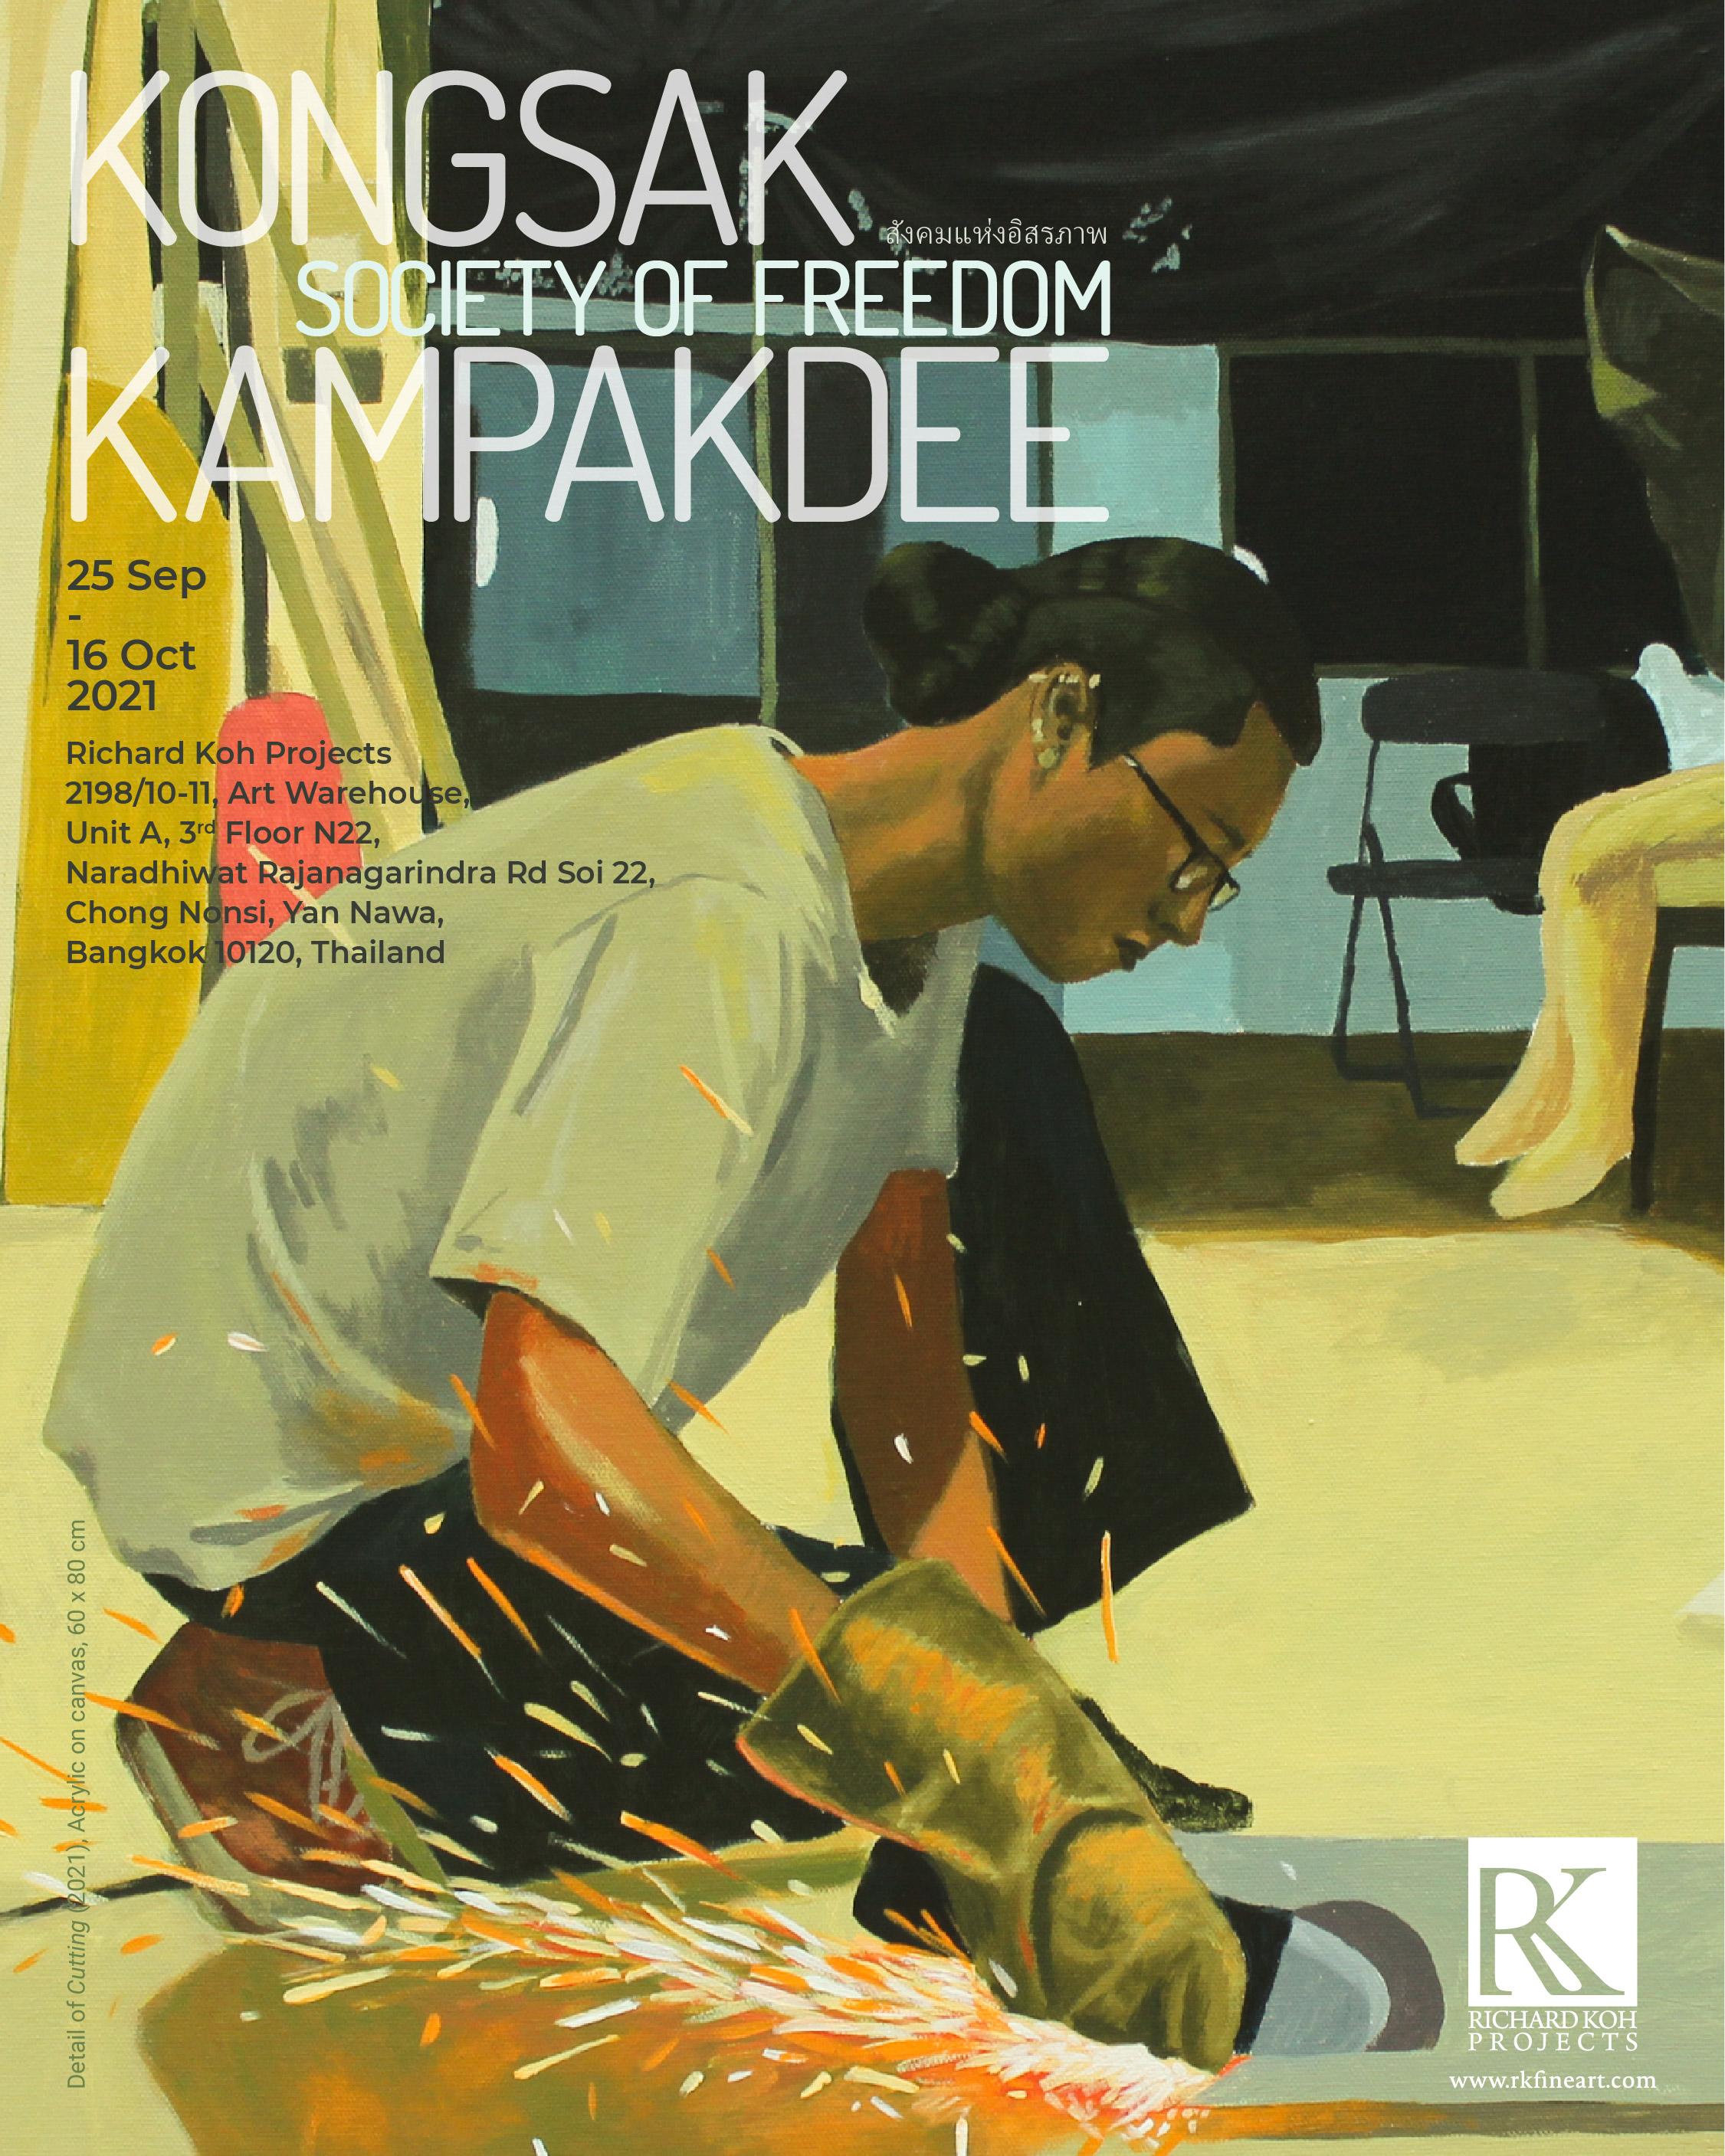 Kongsak Kampakdee – Society of Freedom